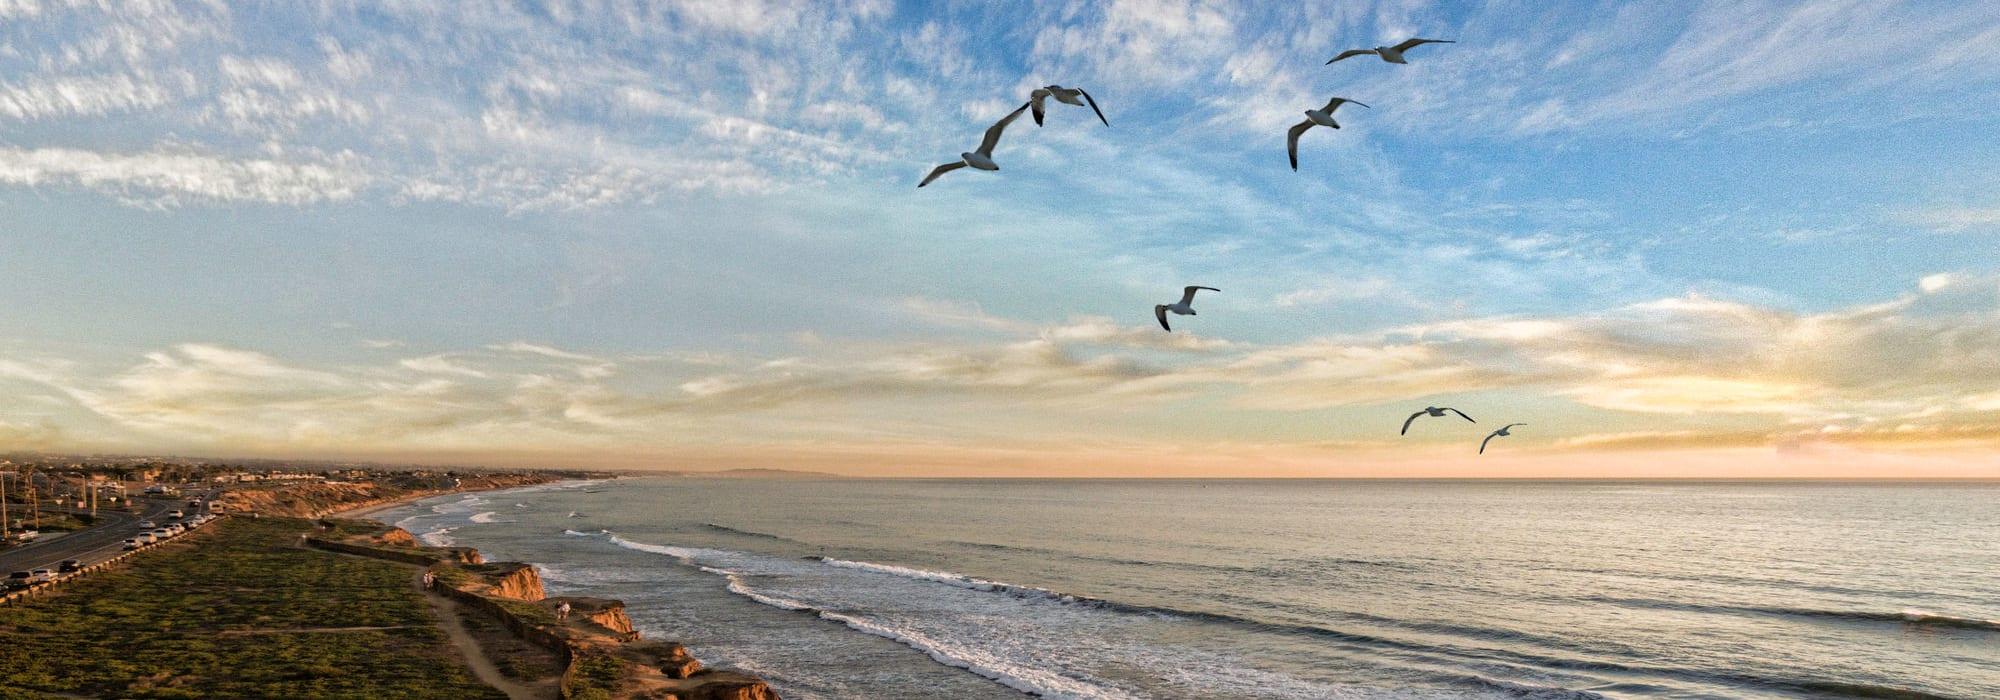 Sunset on the beach near Smart Self Storage of Solana Beach in Solana Beach, California